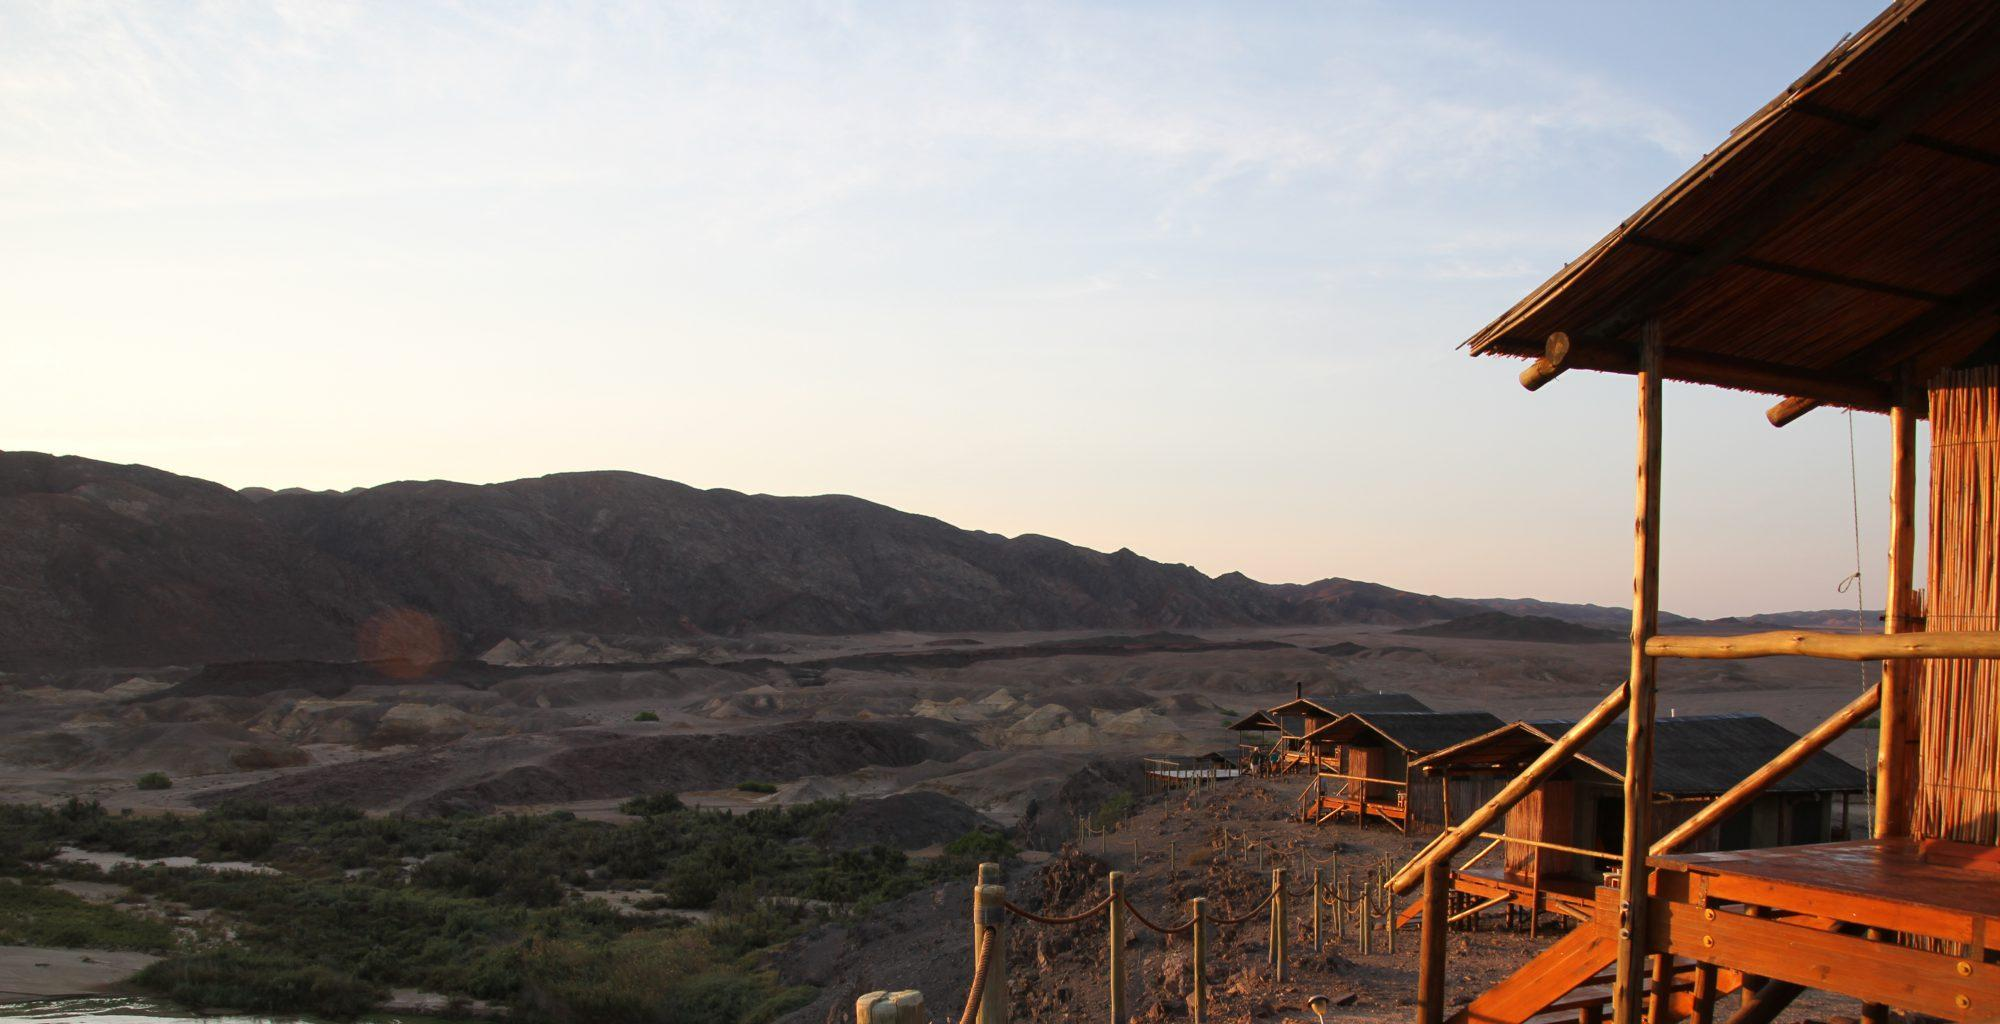 Namibia-Leylandsdrift-Camp-Exterior-View